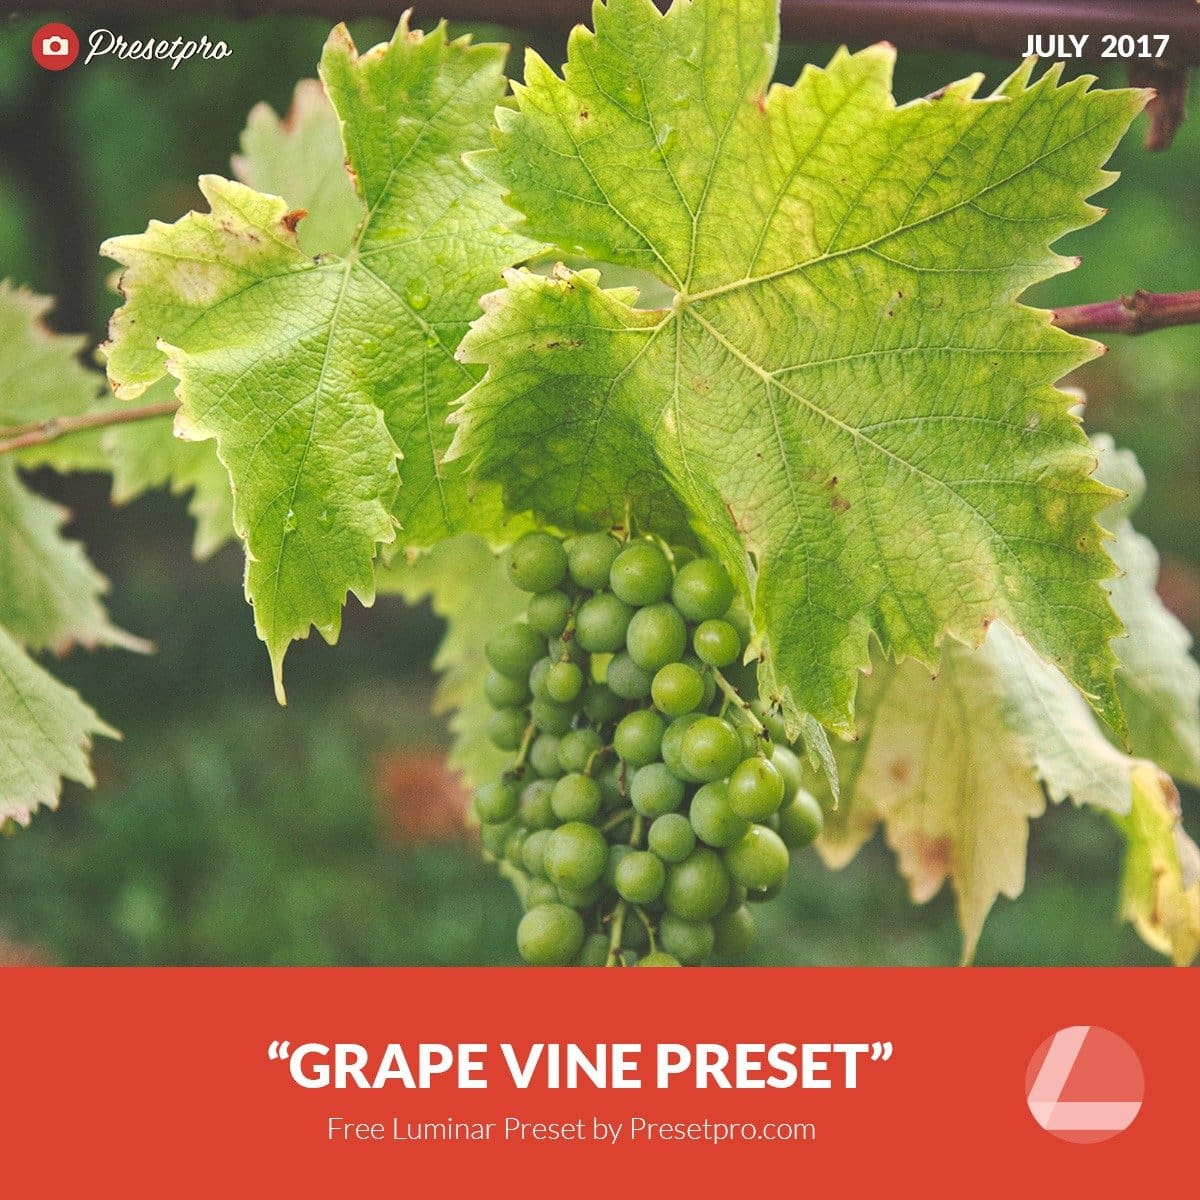 Free-Luminar-Preset-Grape-Vine-Presetpro.com